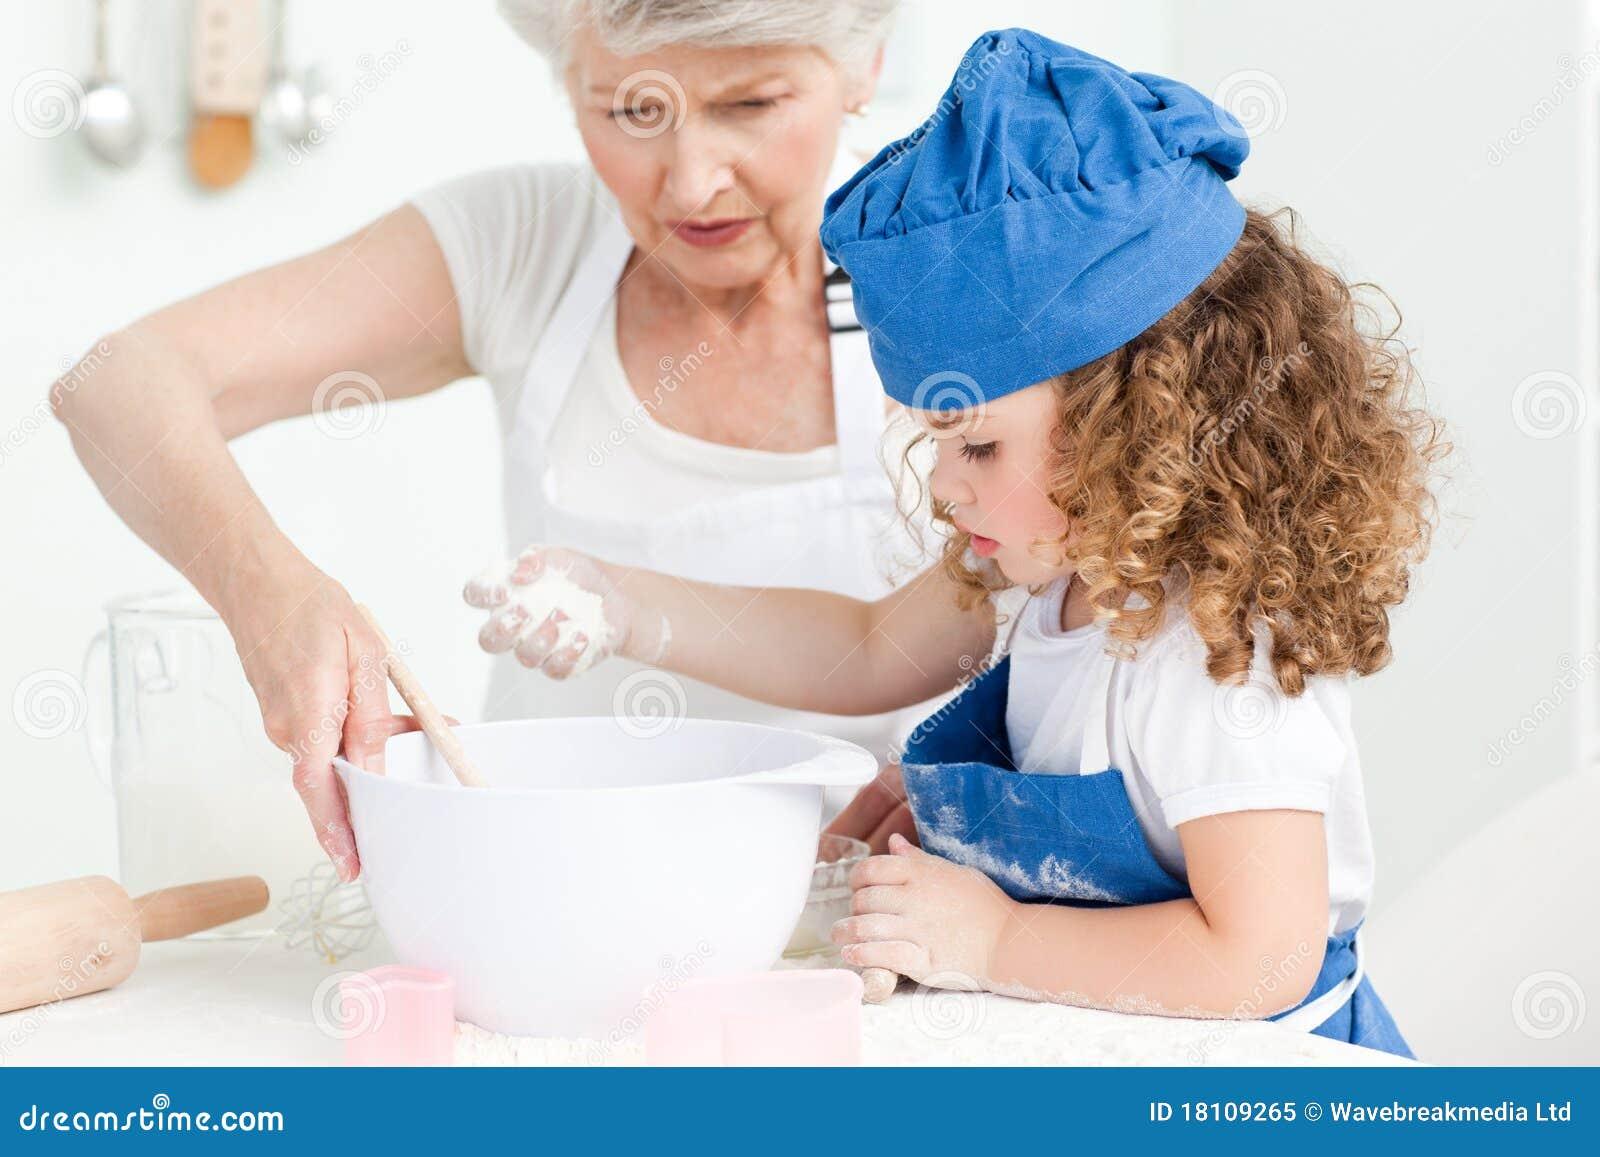 С бабушкой на кухне 7 фотография